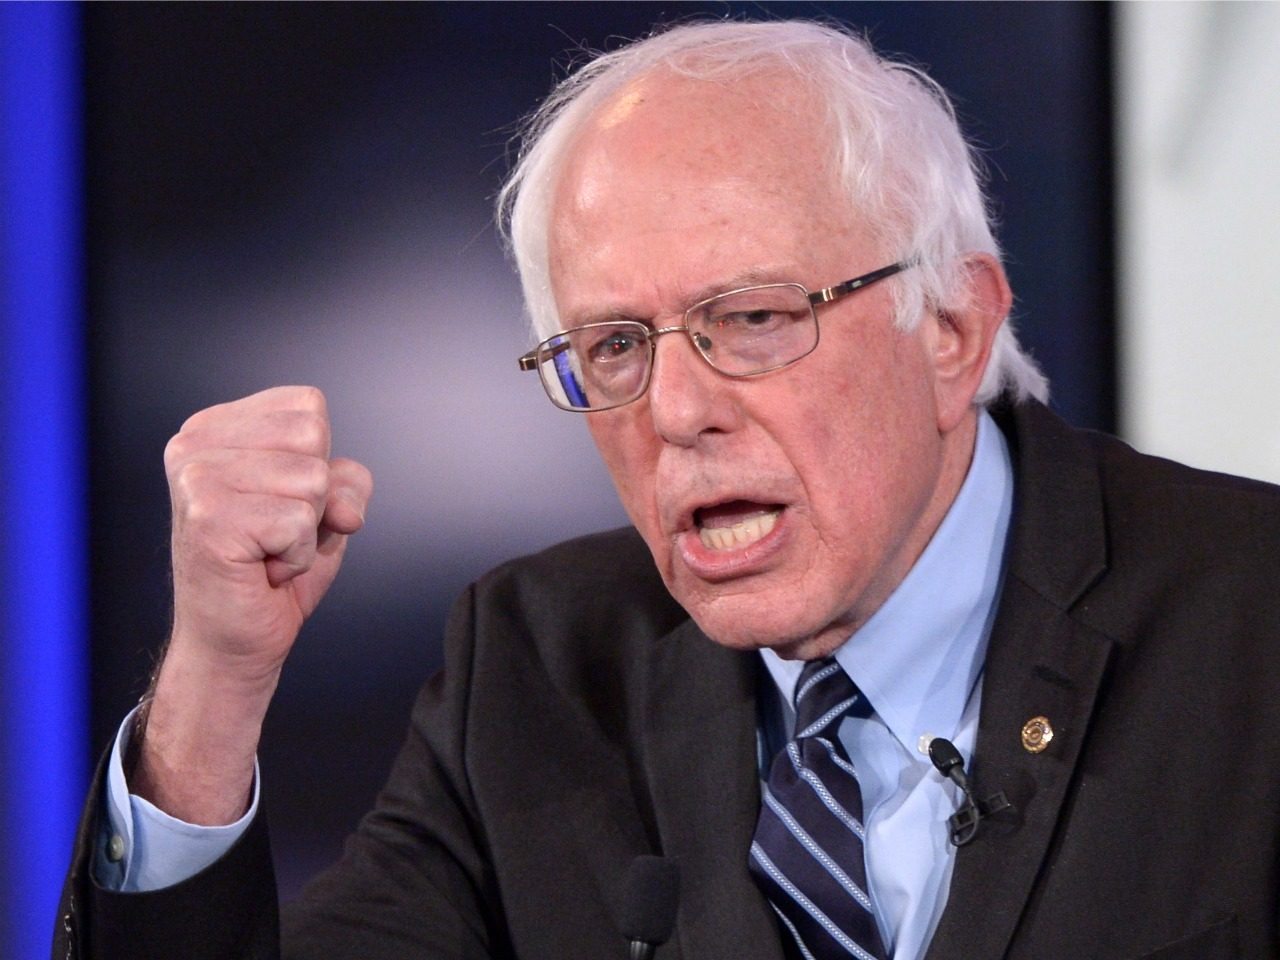 Bernie Sanders Vows to Pardon FALN Terrorist